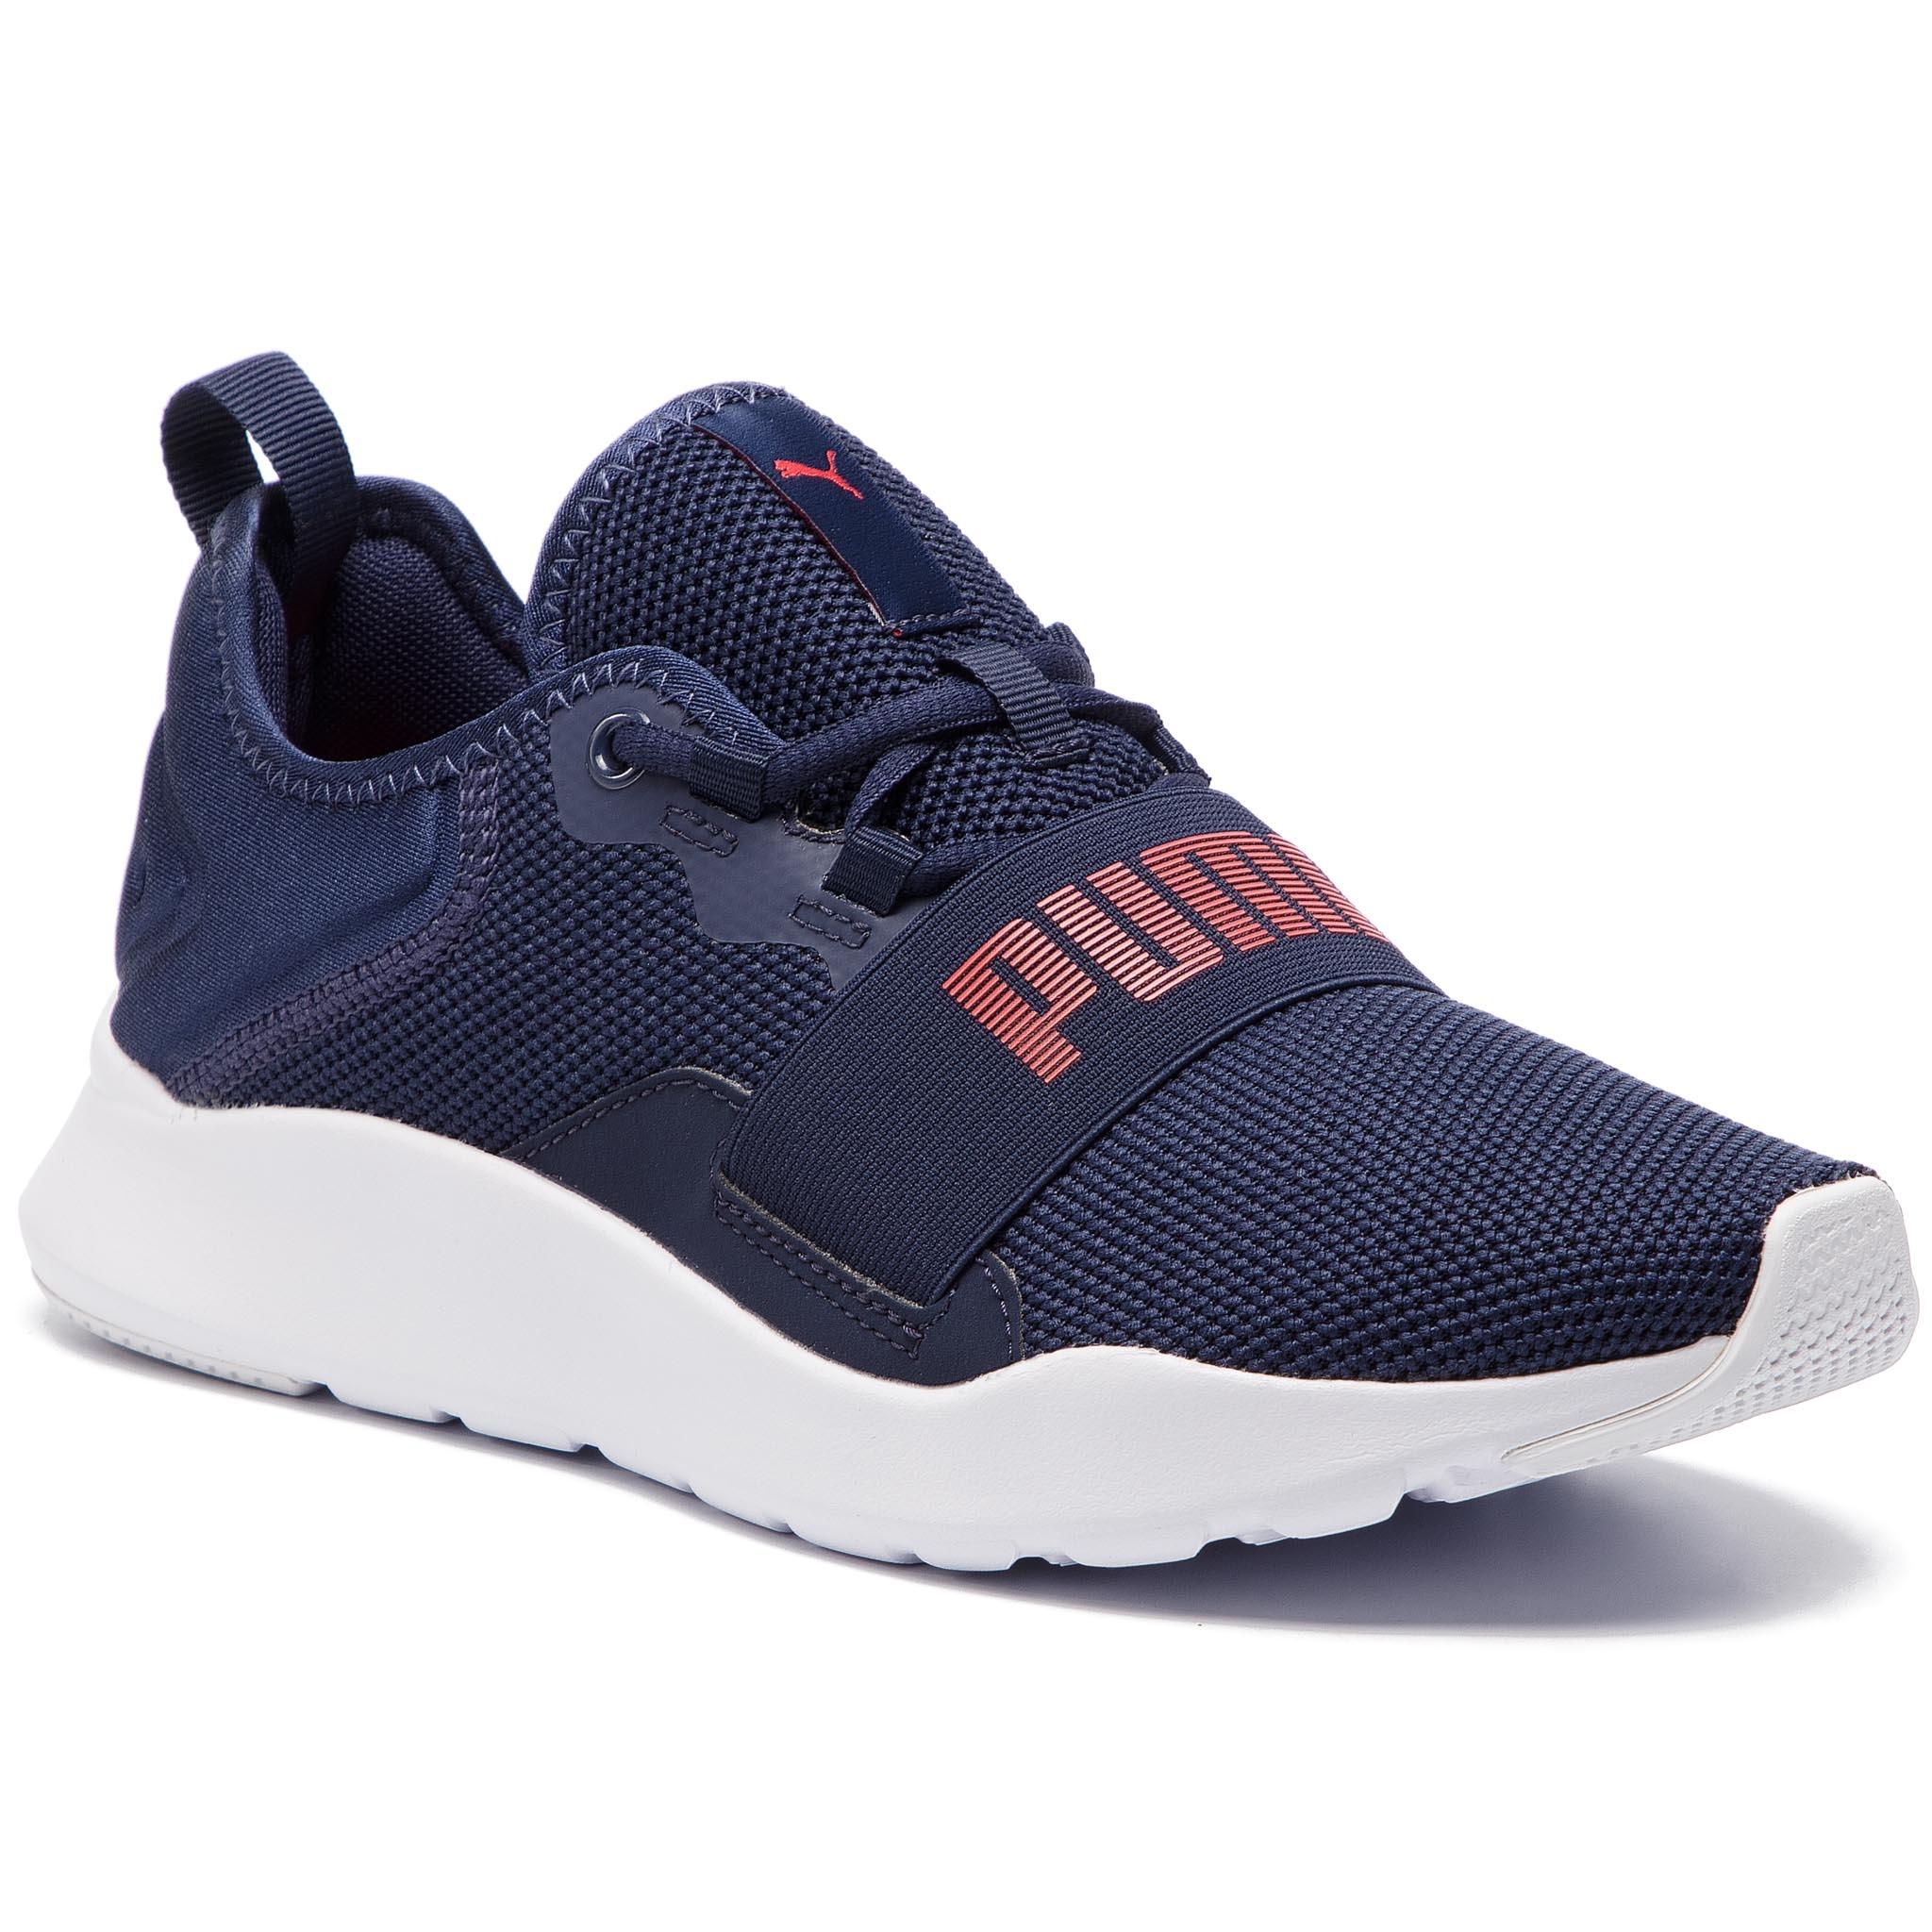 225eda91 Shoes PUMA - Wired 366970 01 Puma Black/Puma Black/Black - Fitness ...